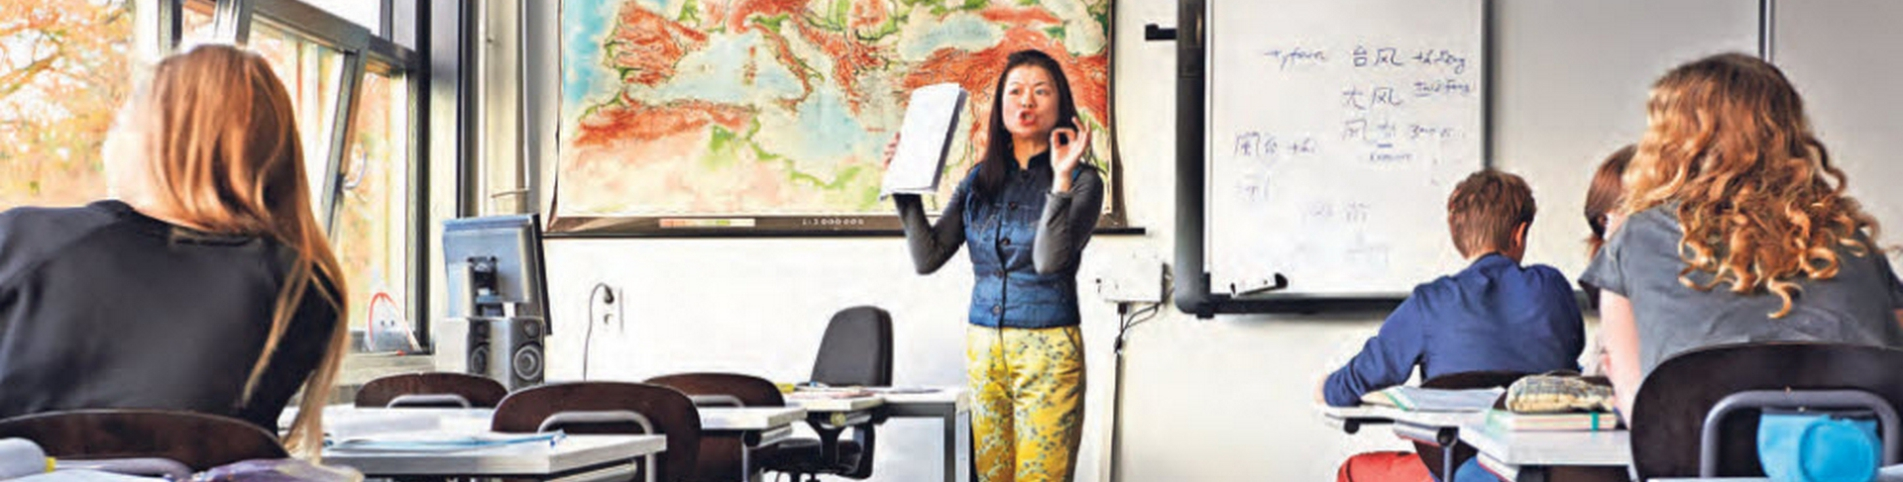 Docent Monica Chen geeft Chinese les Gemeentelijk Gymnasium Hilversum Cursus Chinees Taalles